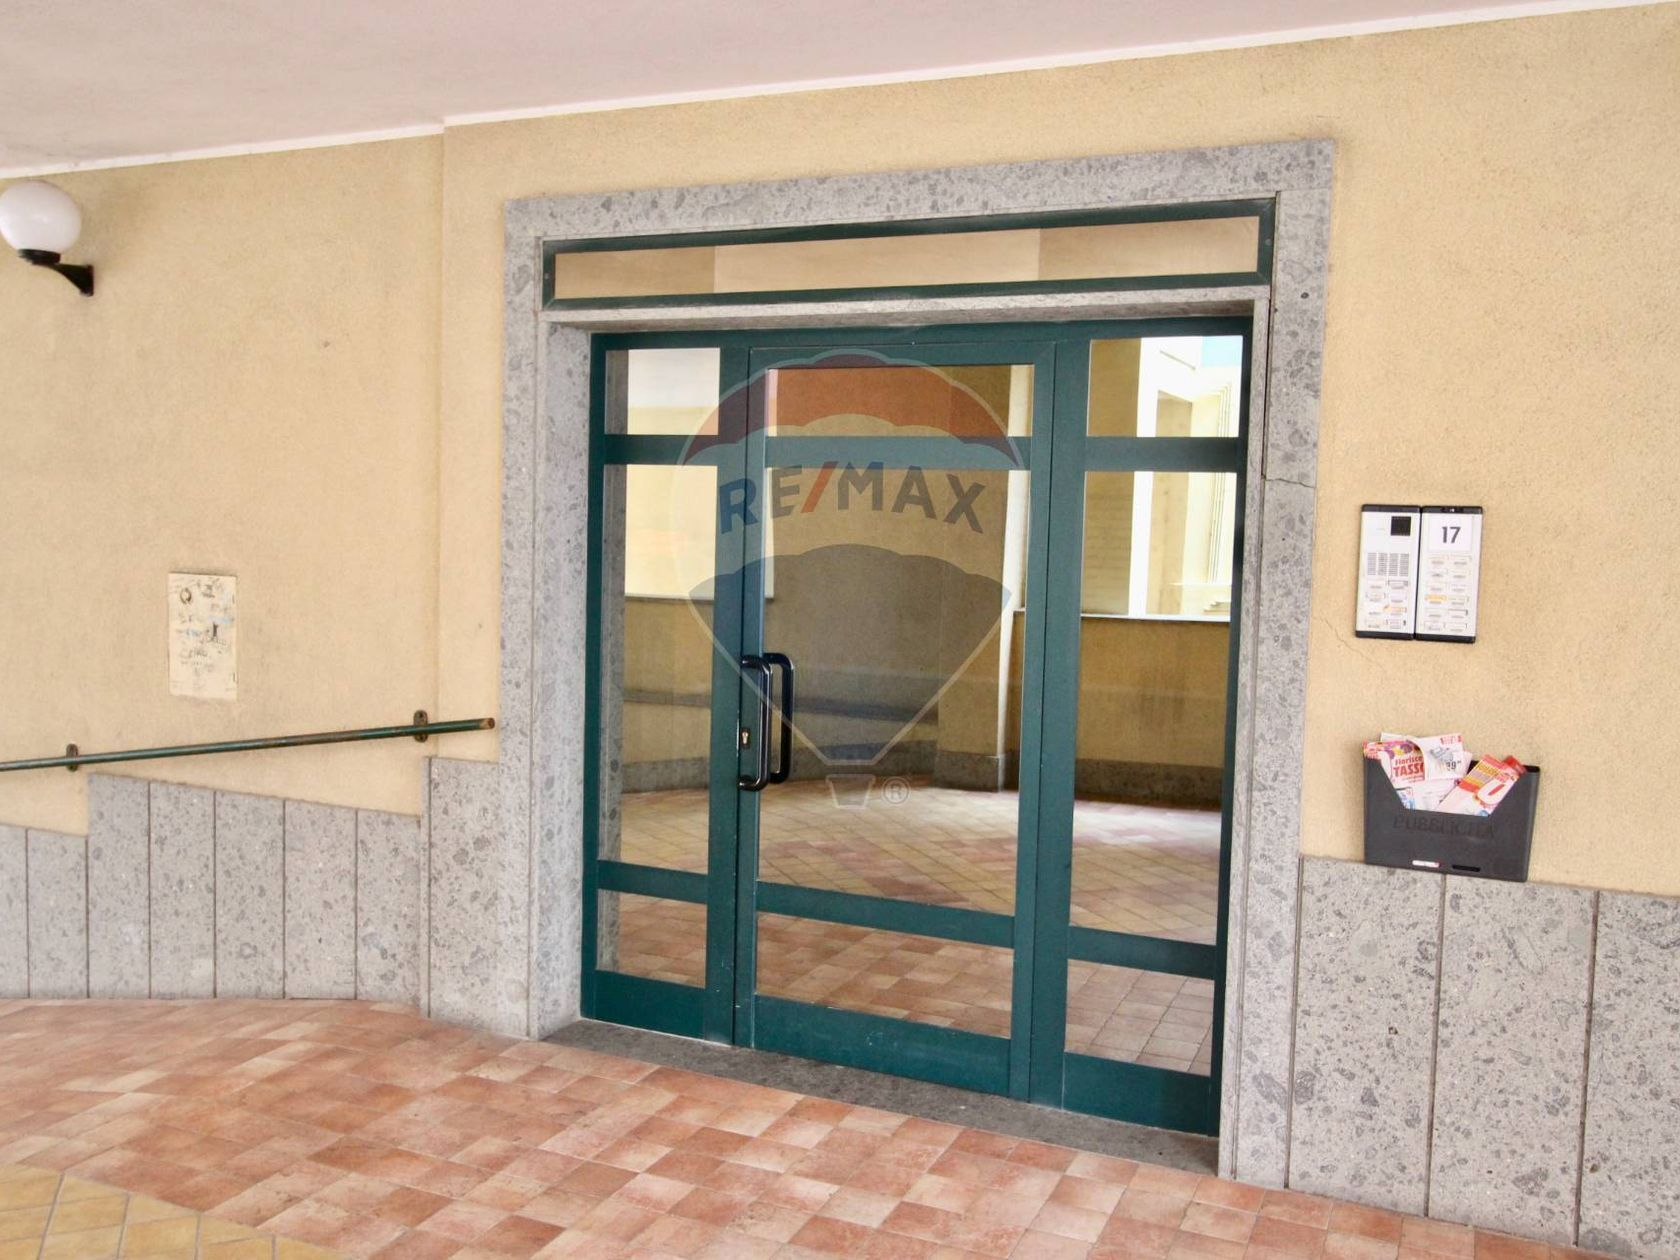 Appartamento Ss-s. Orsola Storica, Sassari, SS Vendita - Foto 19